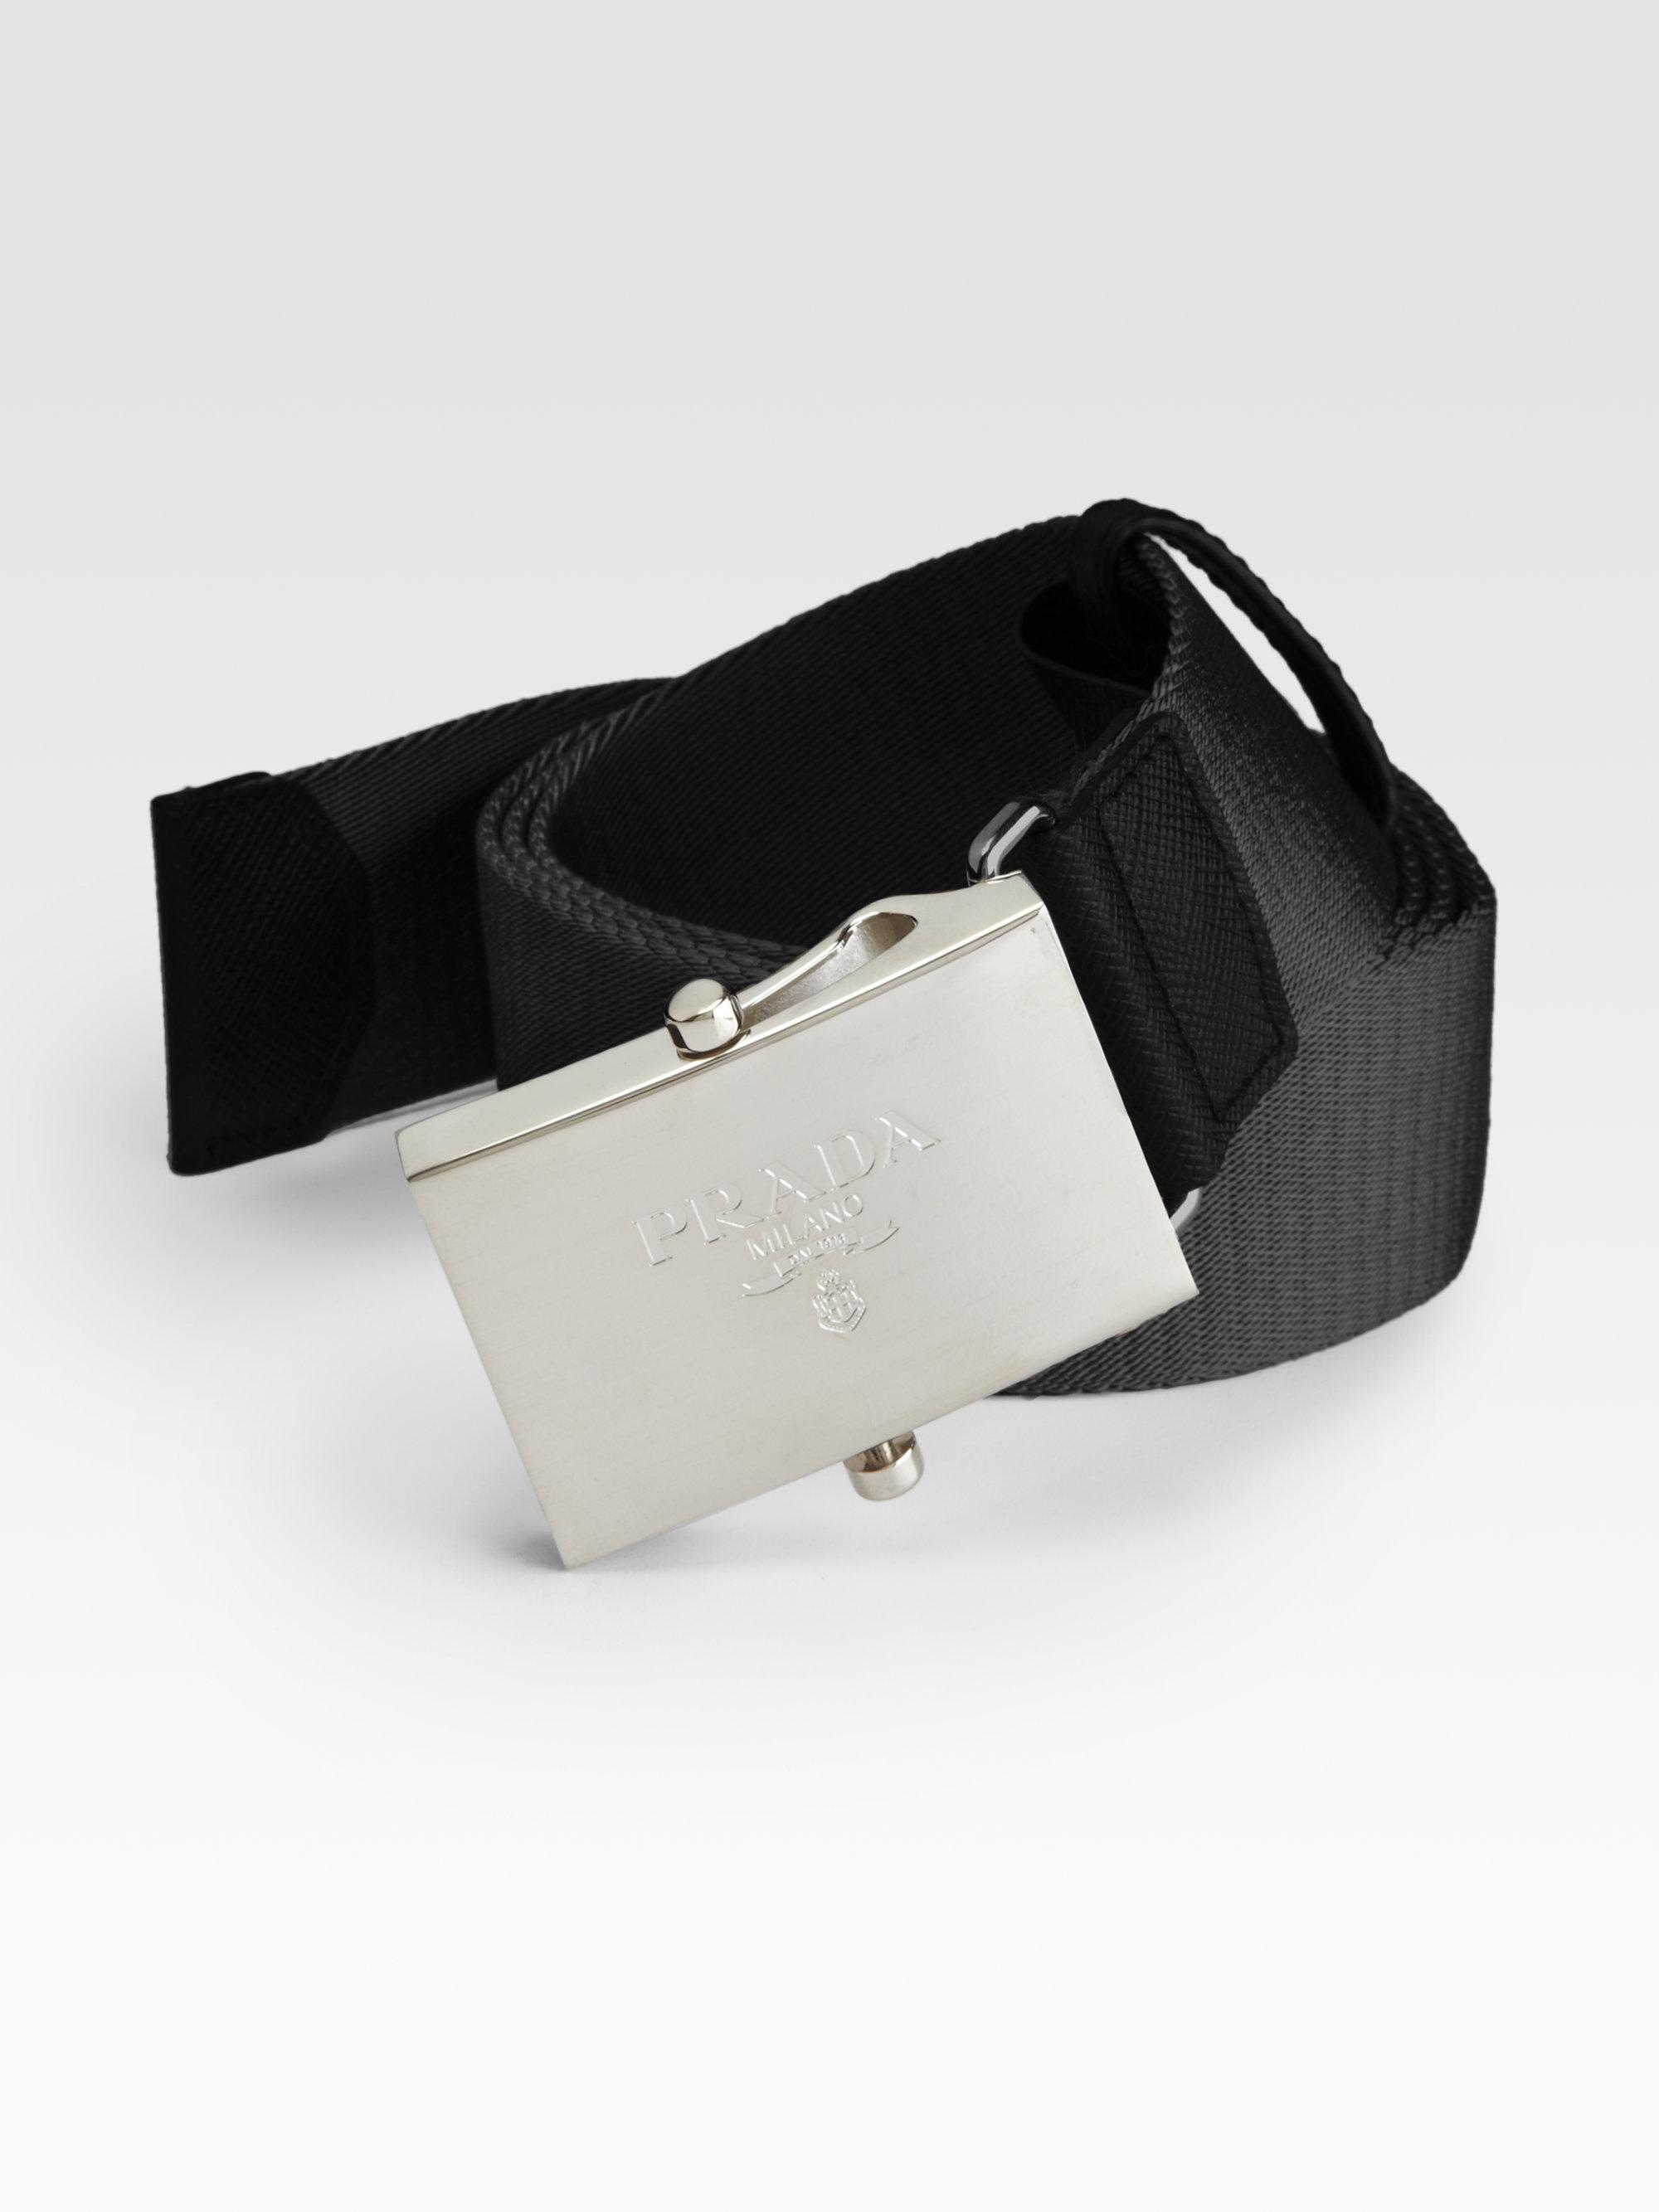 ... canada lyst prada nylon belt in black for men 92301 8cfcb b0a5e0657d840